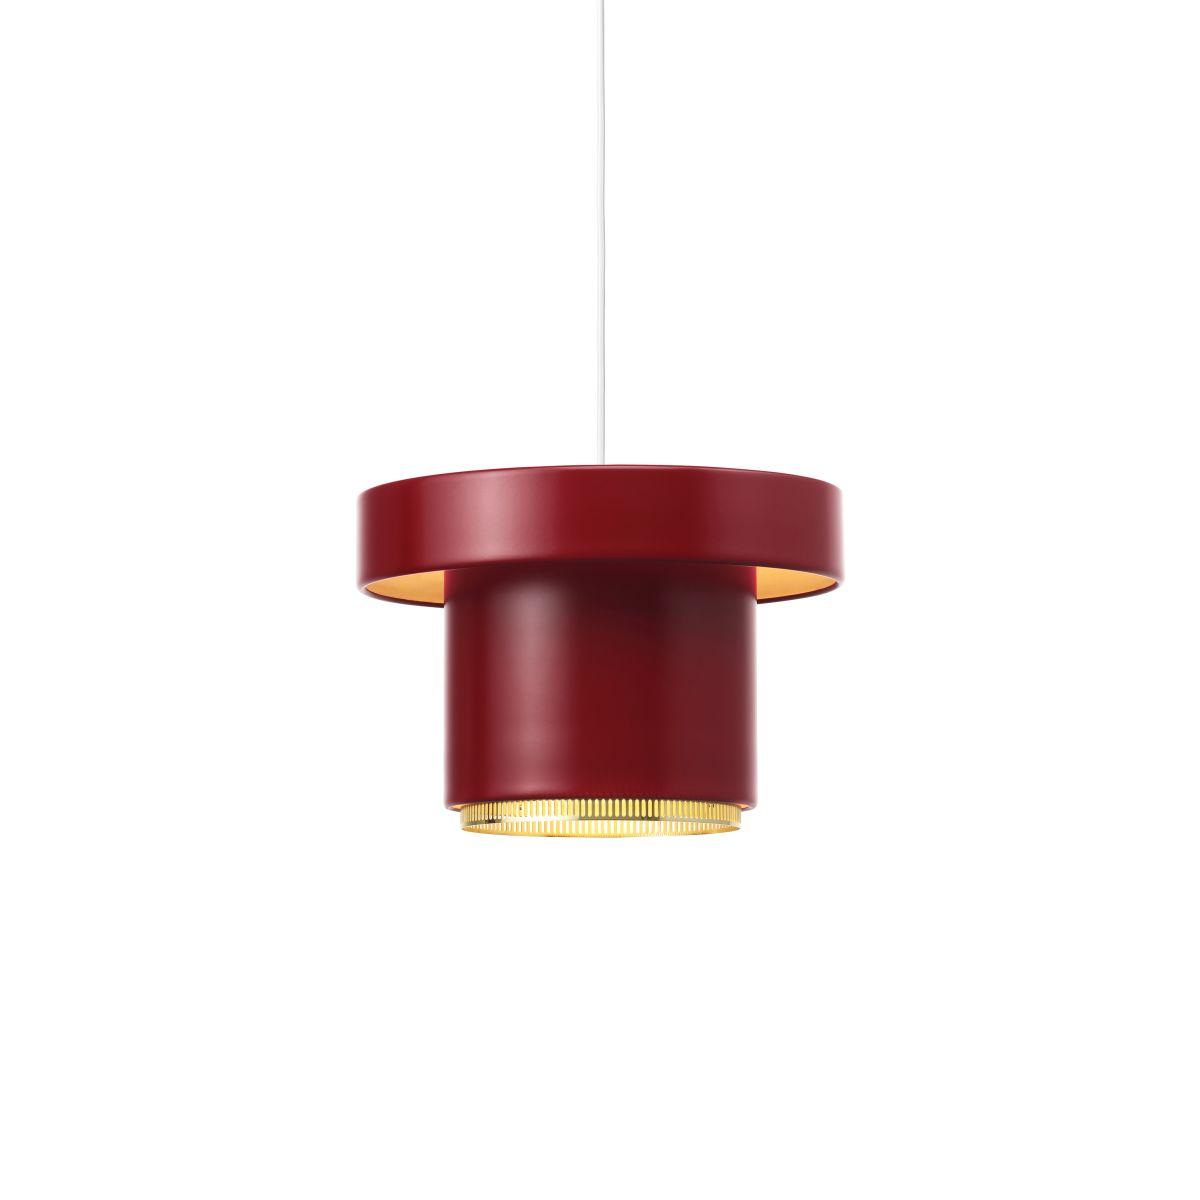 A201-red-brass-light-on_F-2859728